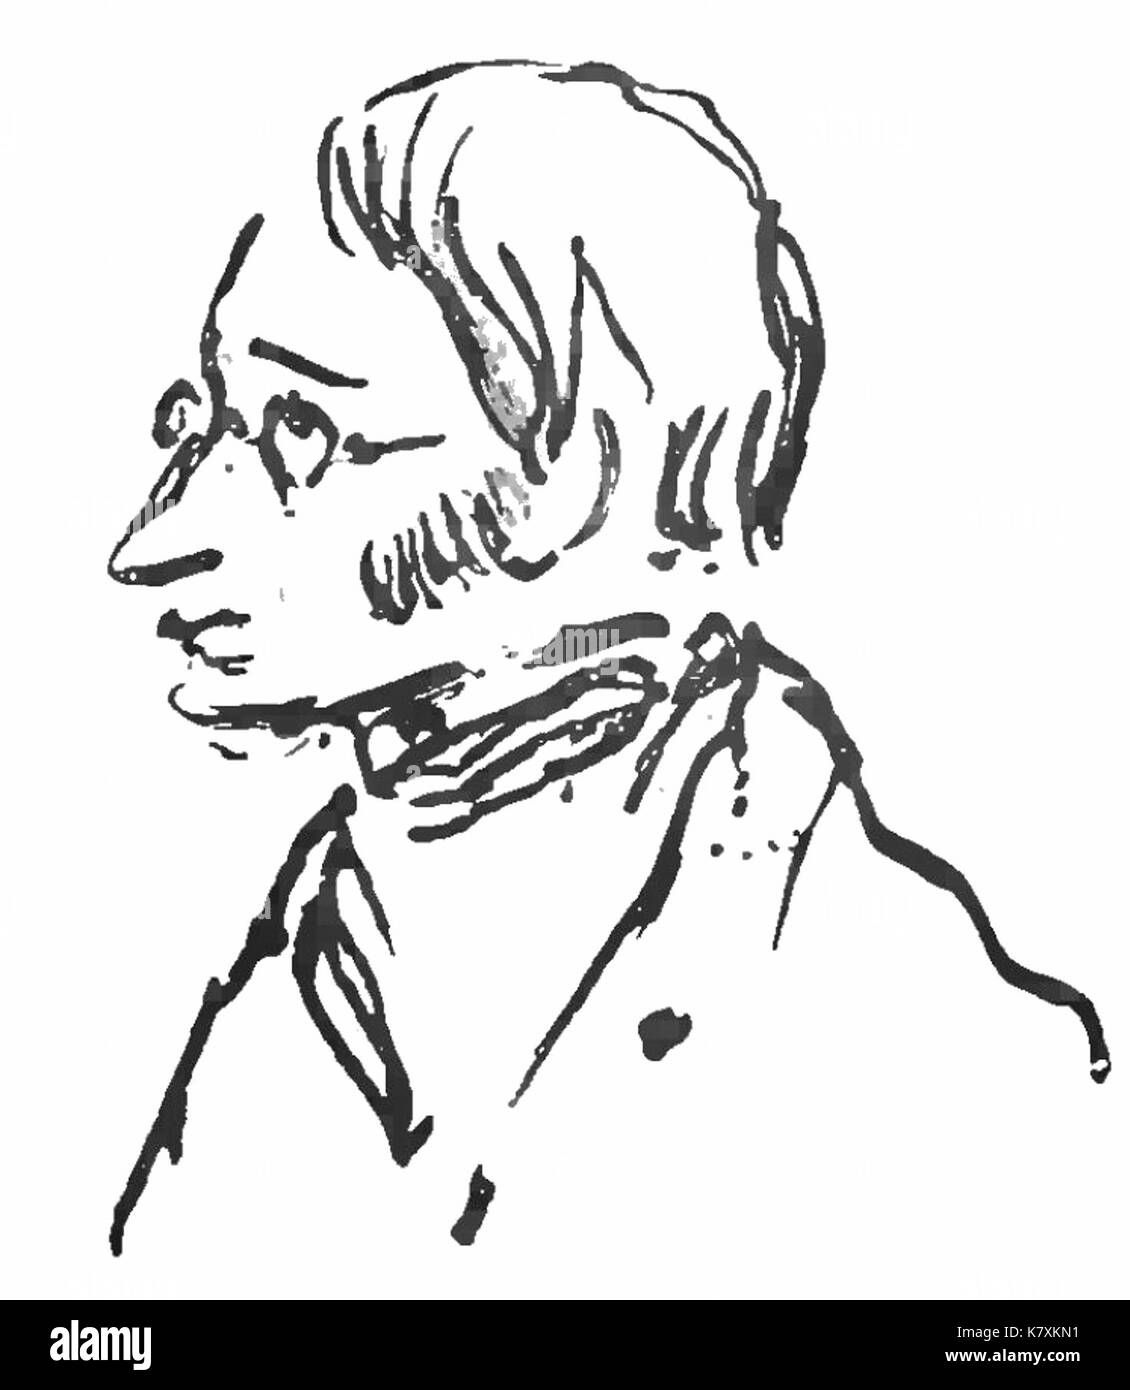 Joseph Henri par Victor Hugo, Choses vues, tome I - Stock Image